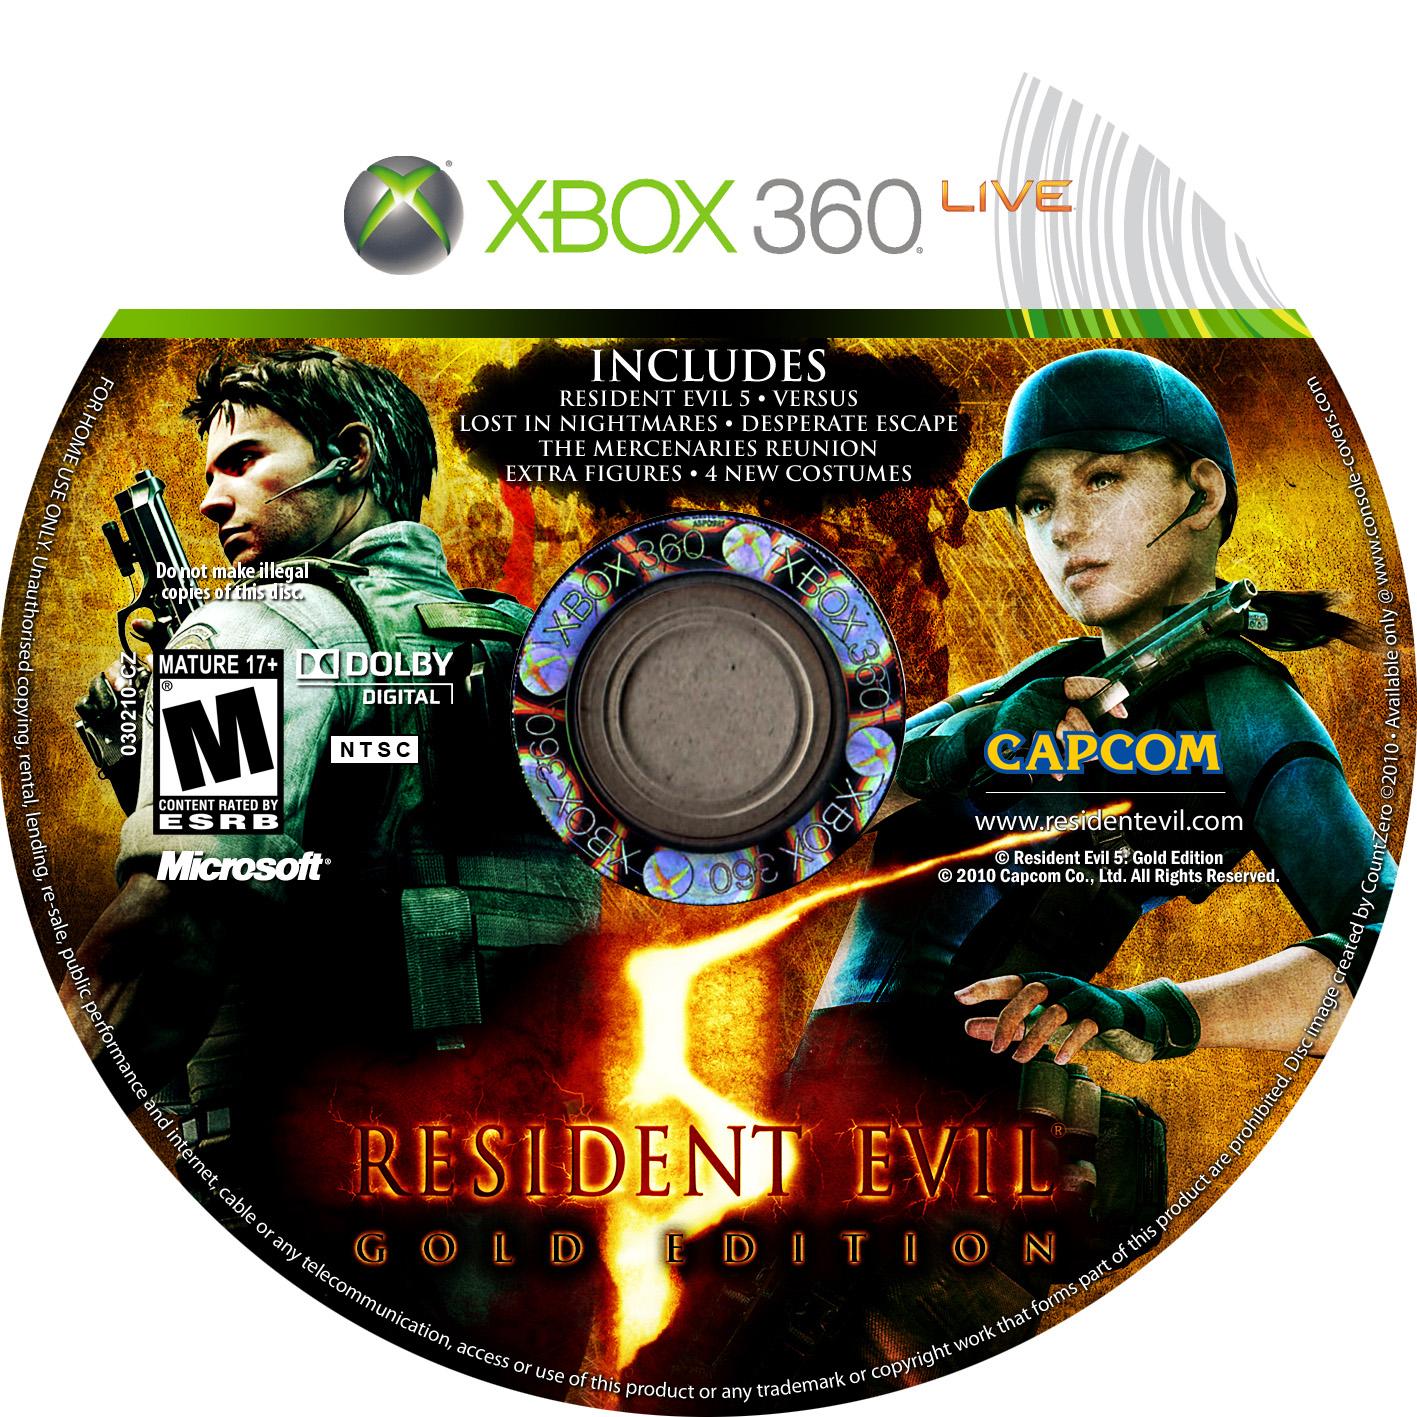 Capa Label Jogo XBOX 360 - Resident Evil 5 - Gold Edition